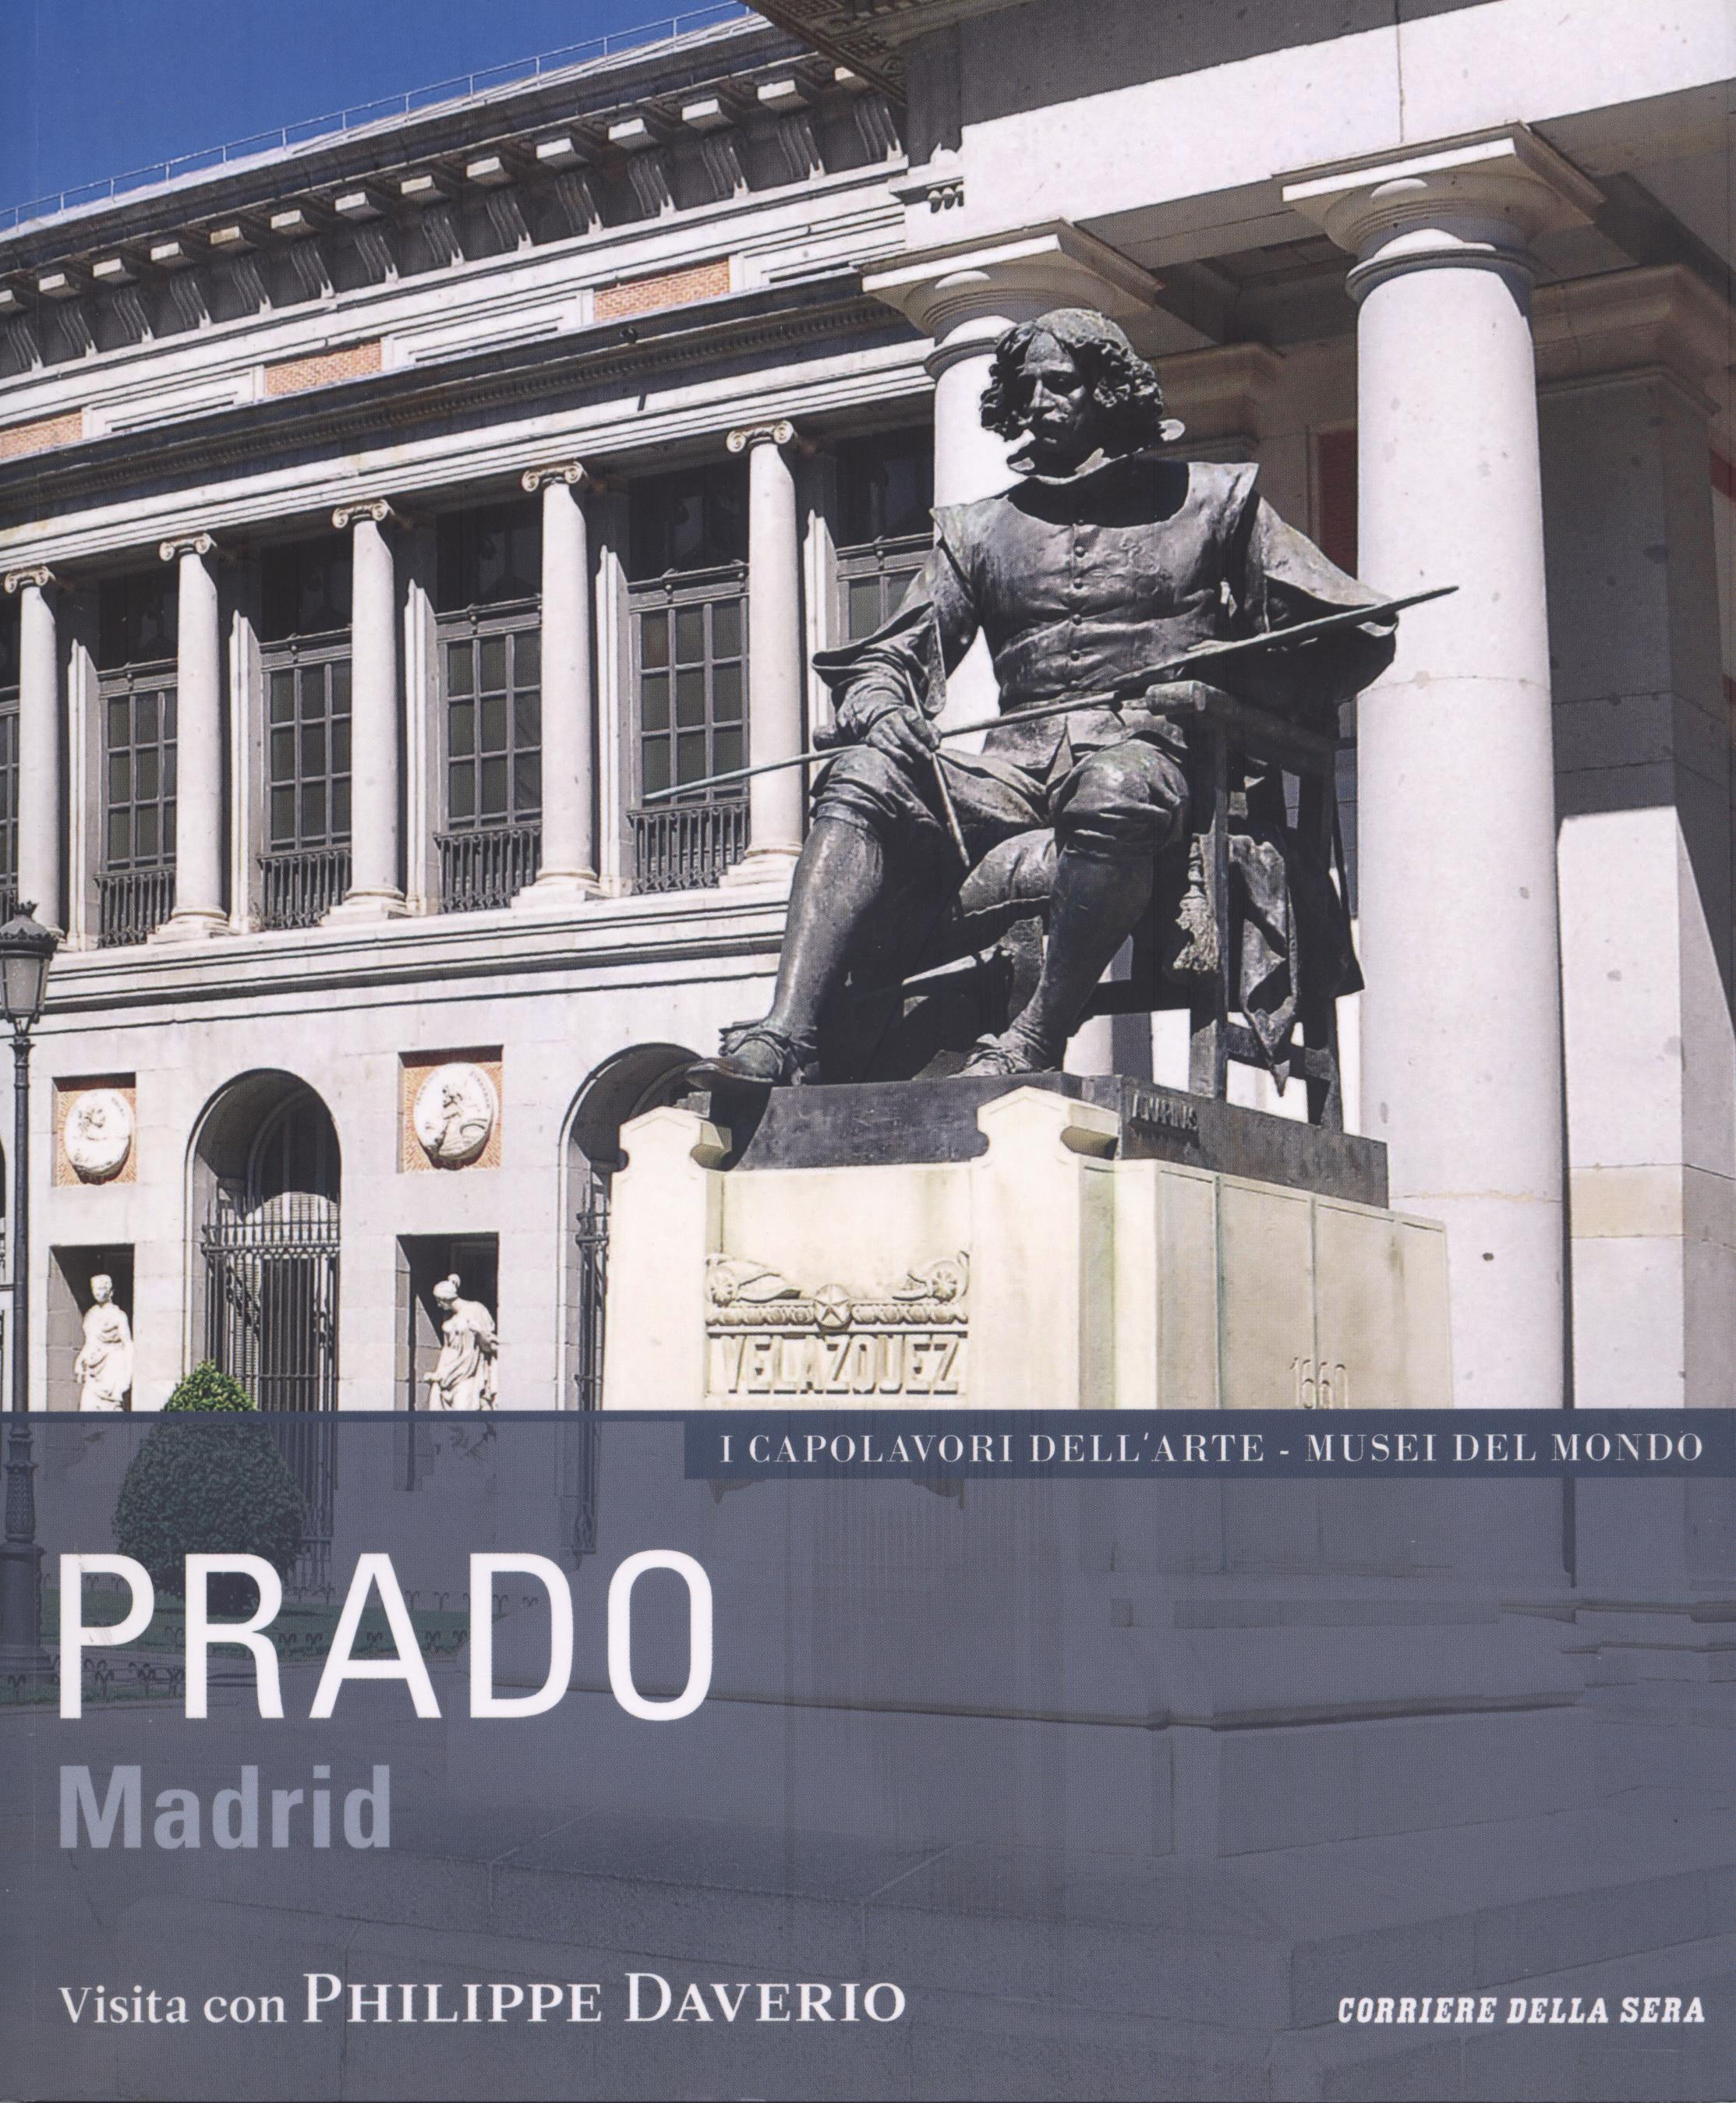 Prado, Madrid